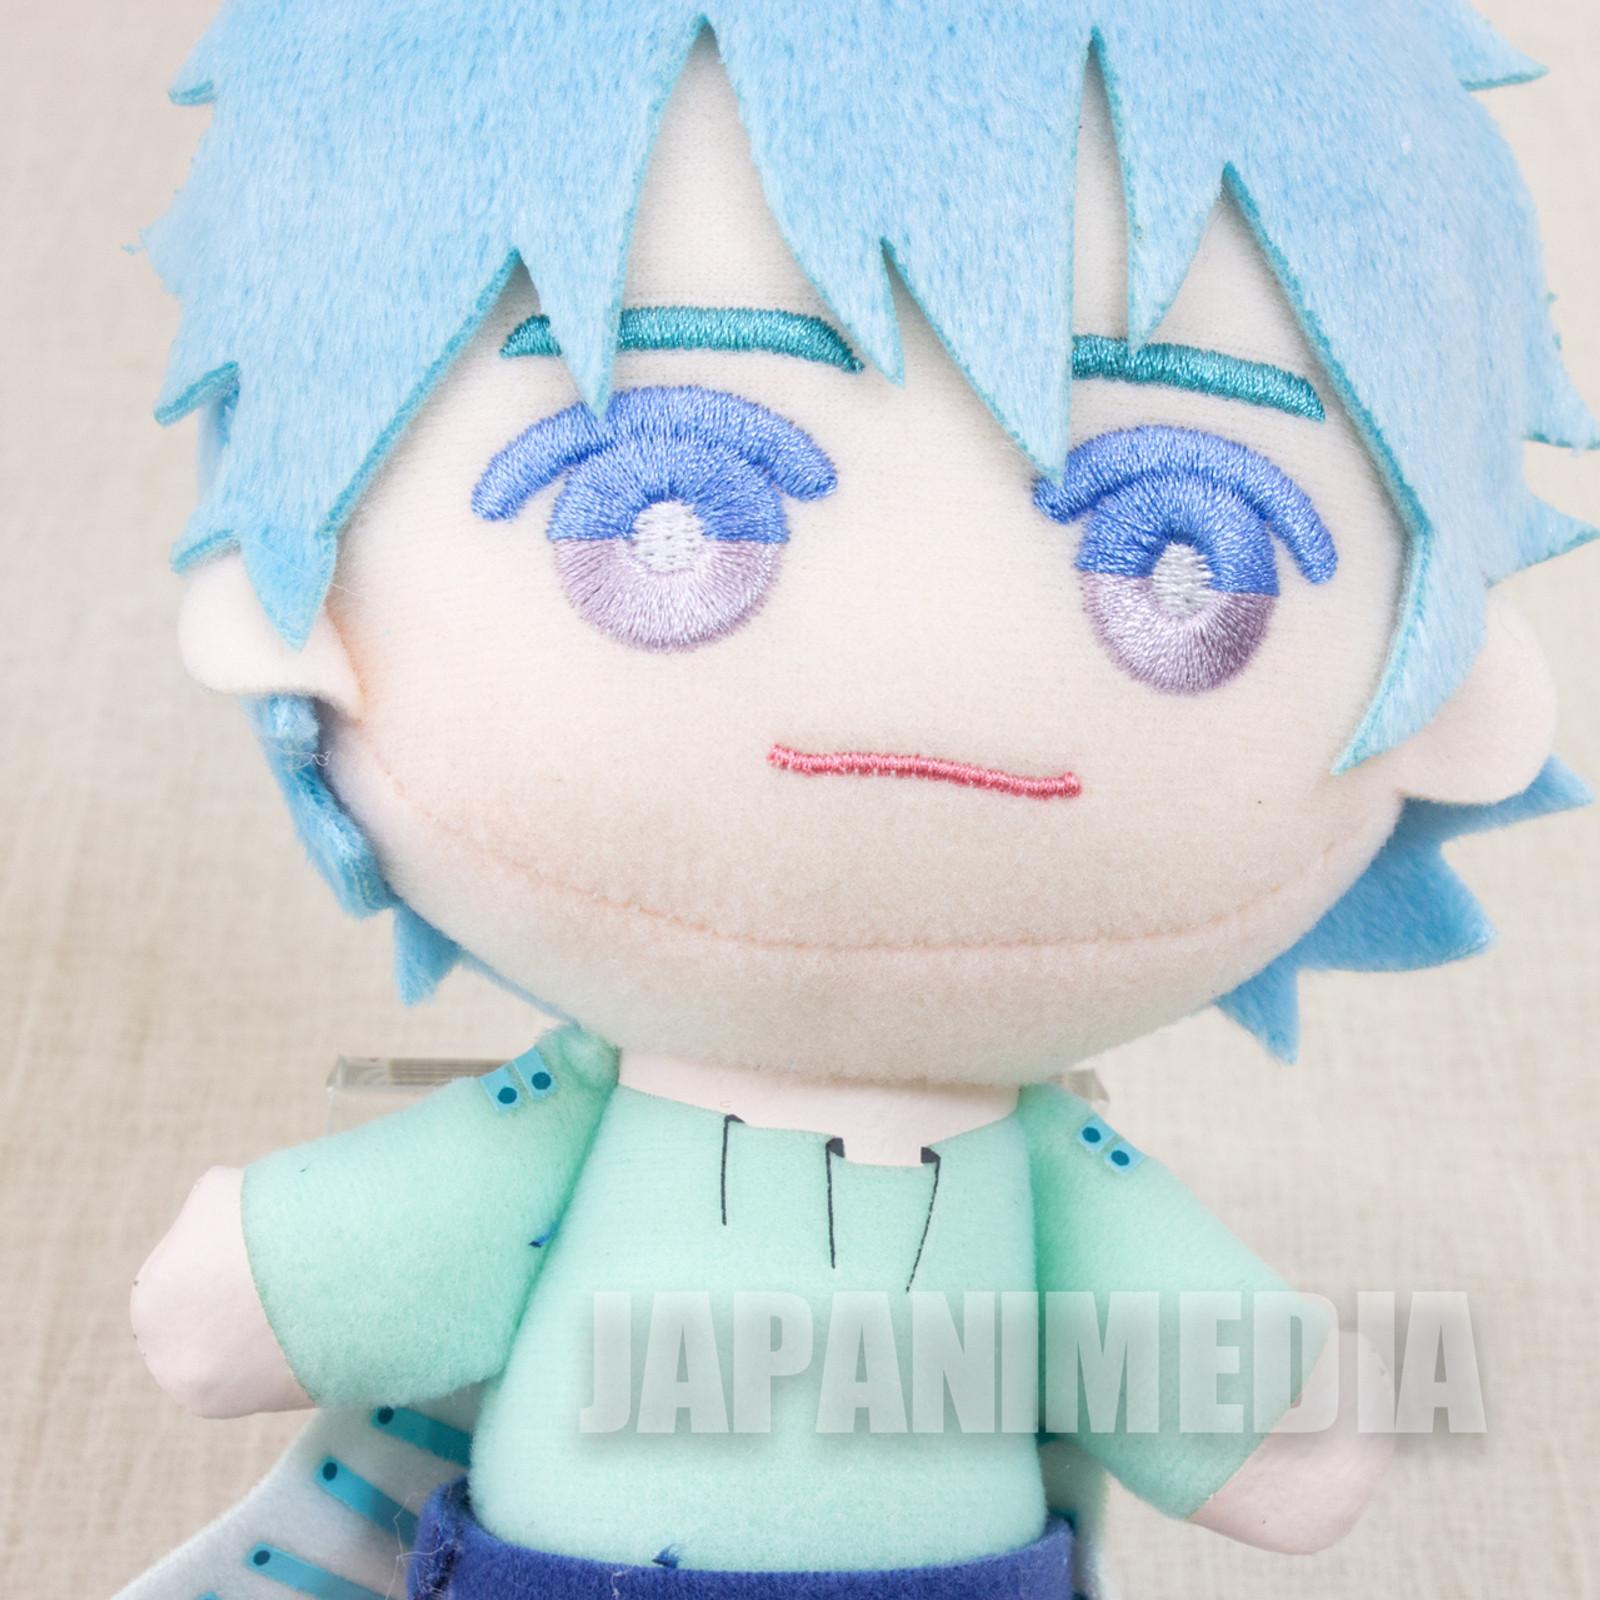 Hakyu Hoshin Engi Fugen Tomo-nui Plush doll JAPAN ANIME MANGA